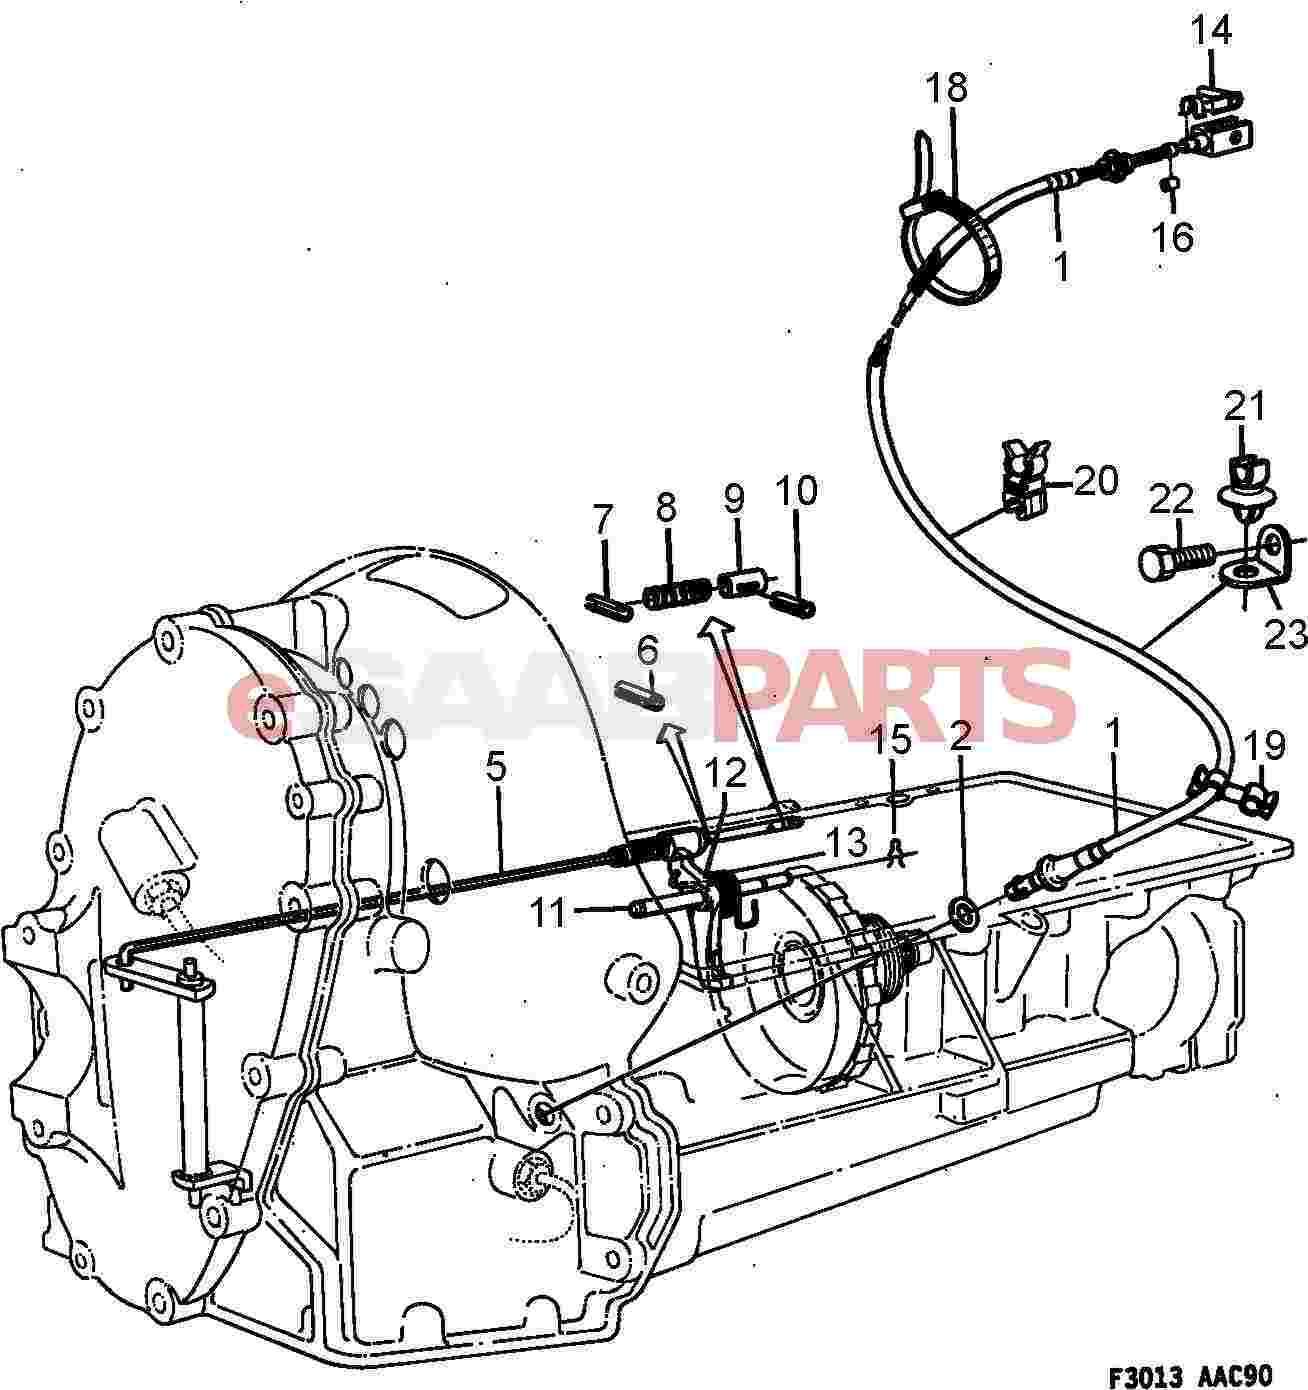 Ls Engine Diagram 2004 Chrysler Concorde • Wiring Diagram